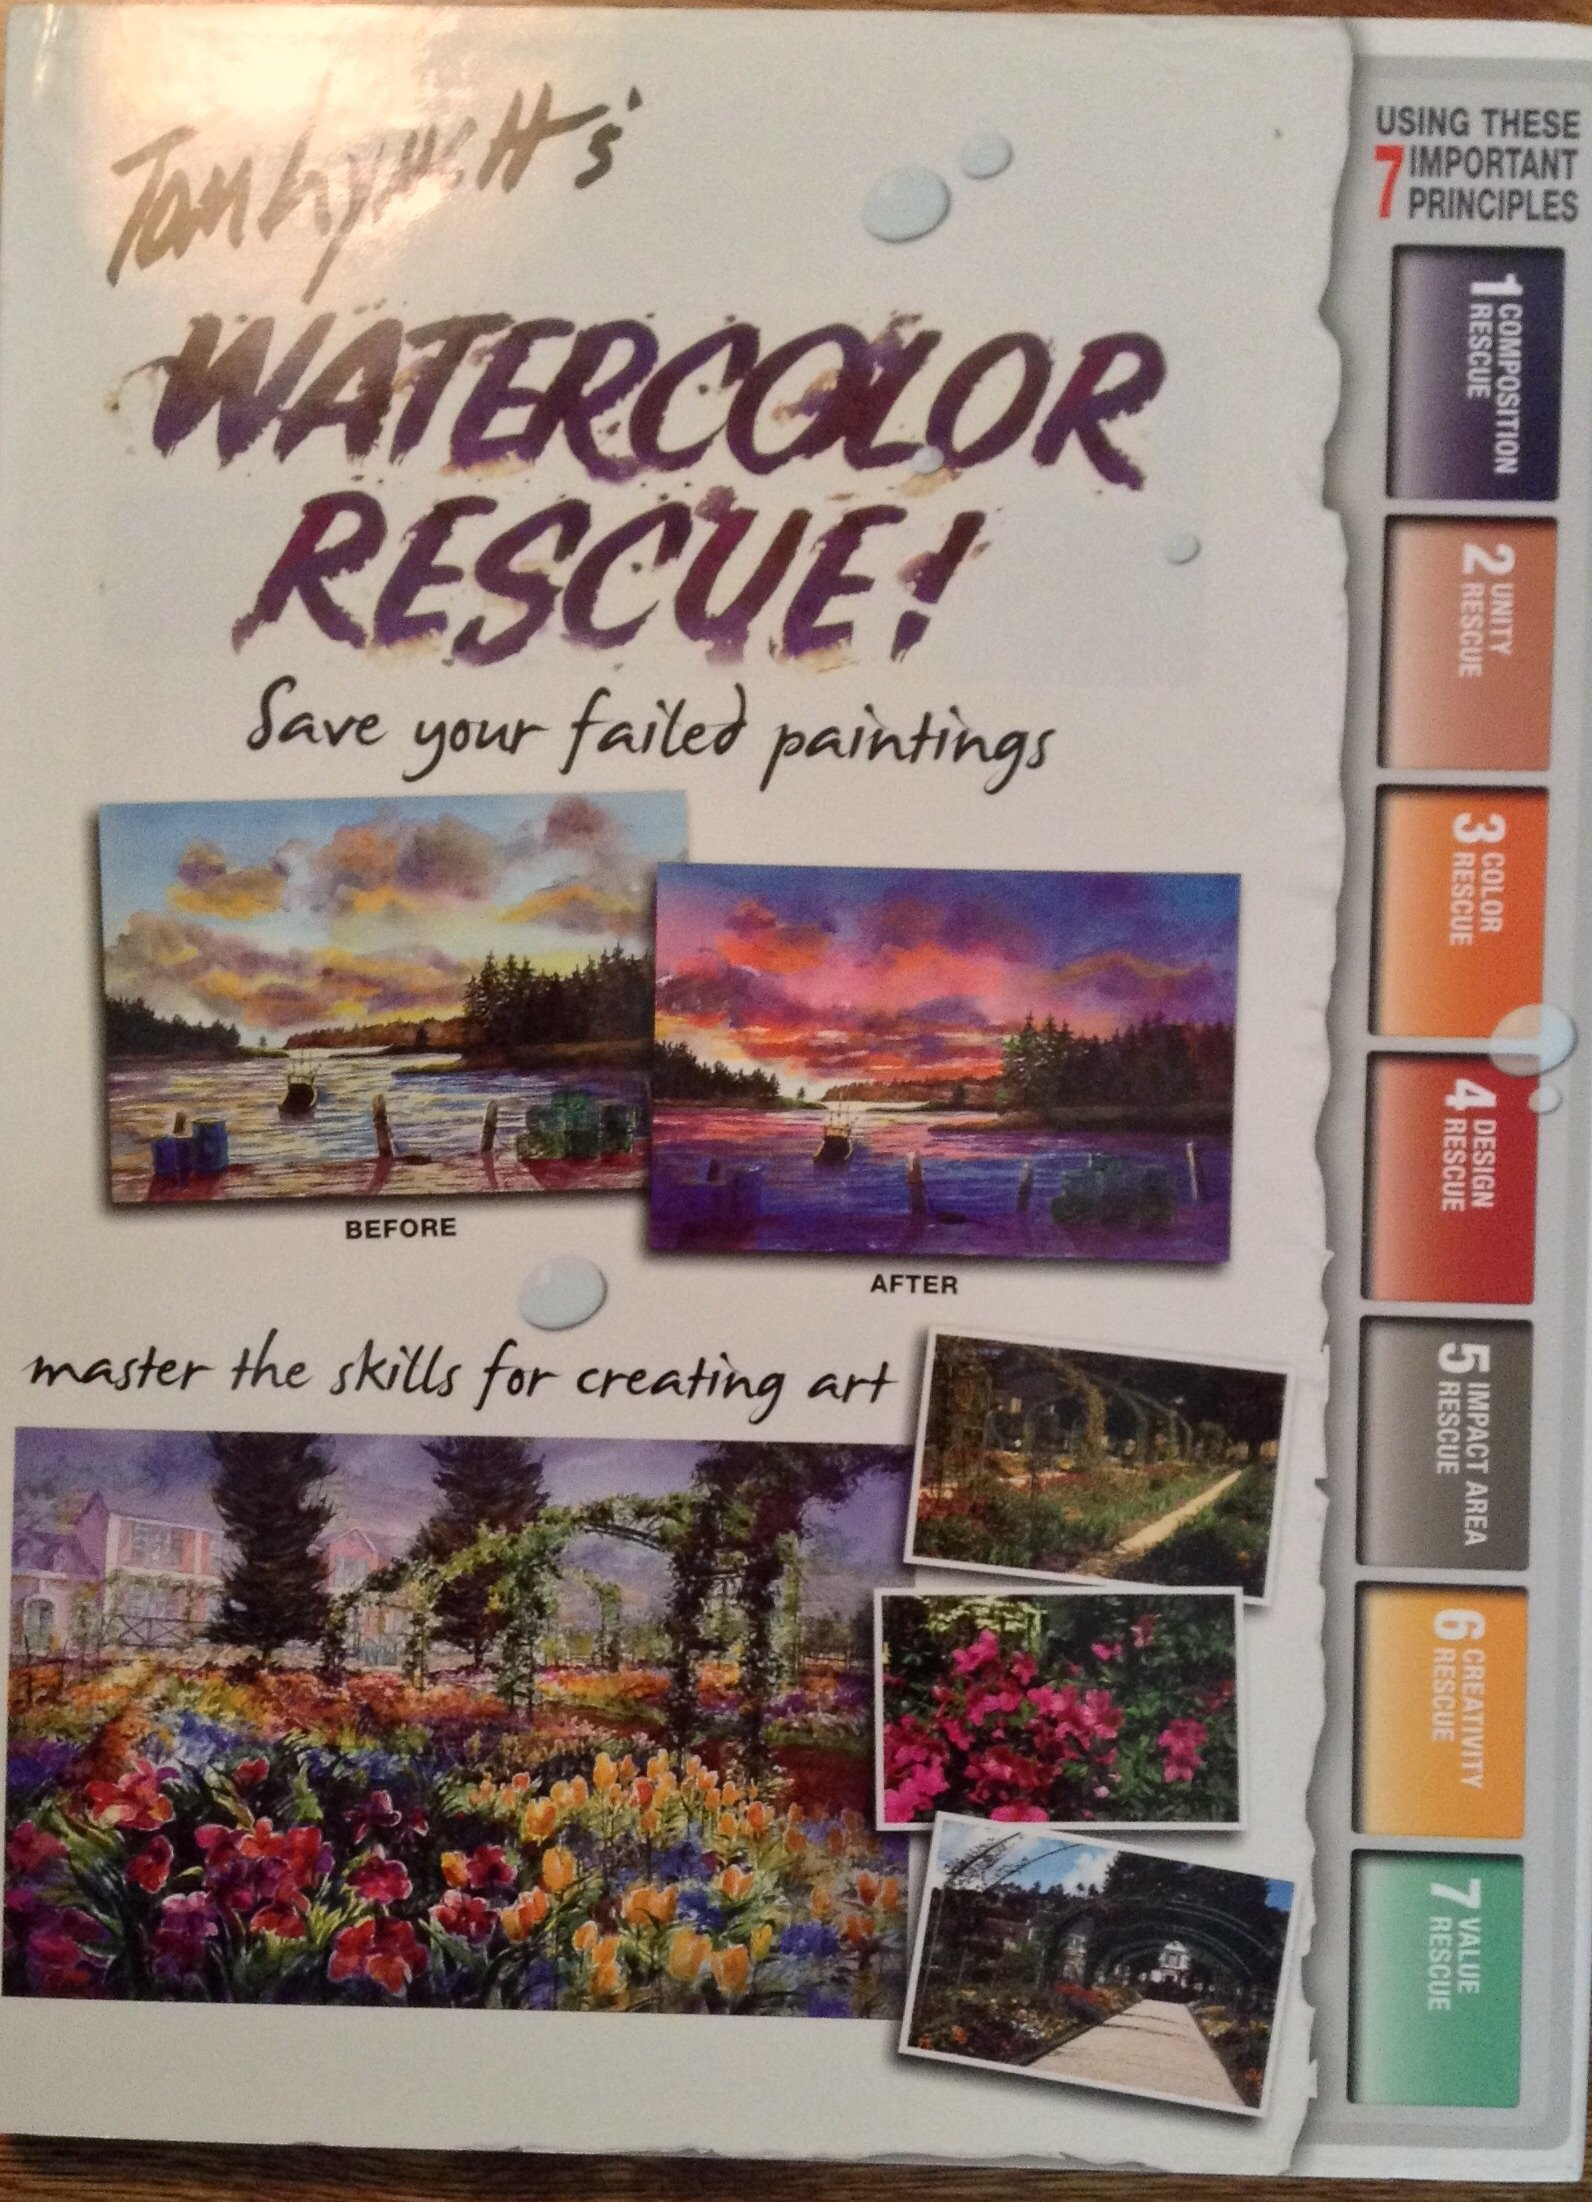 Tom Lynch S Watercolor Rescue Tom Lynch 9781929834624 Amazon Com Books